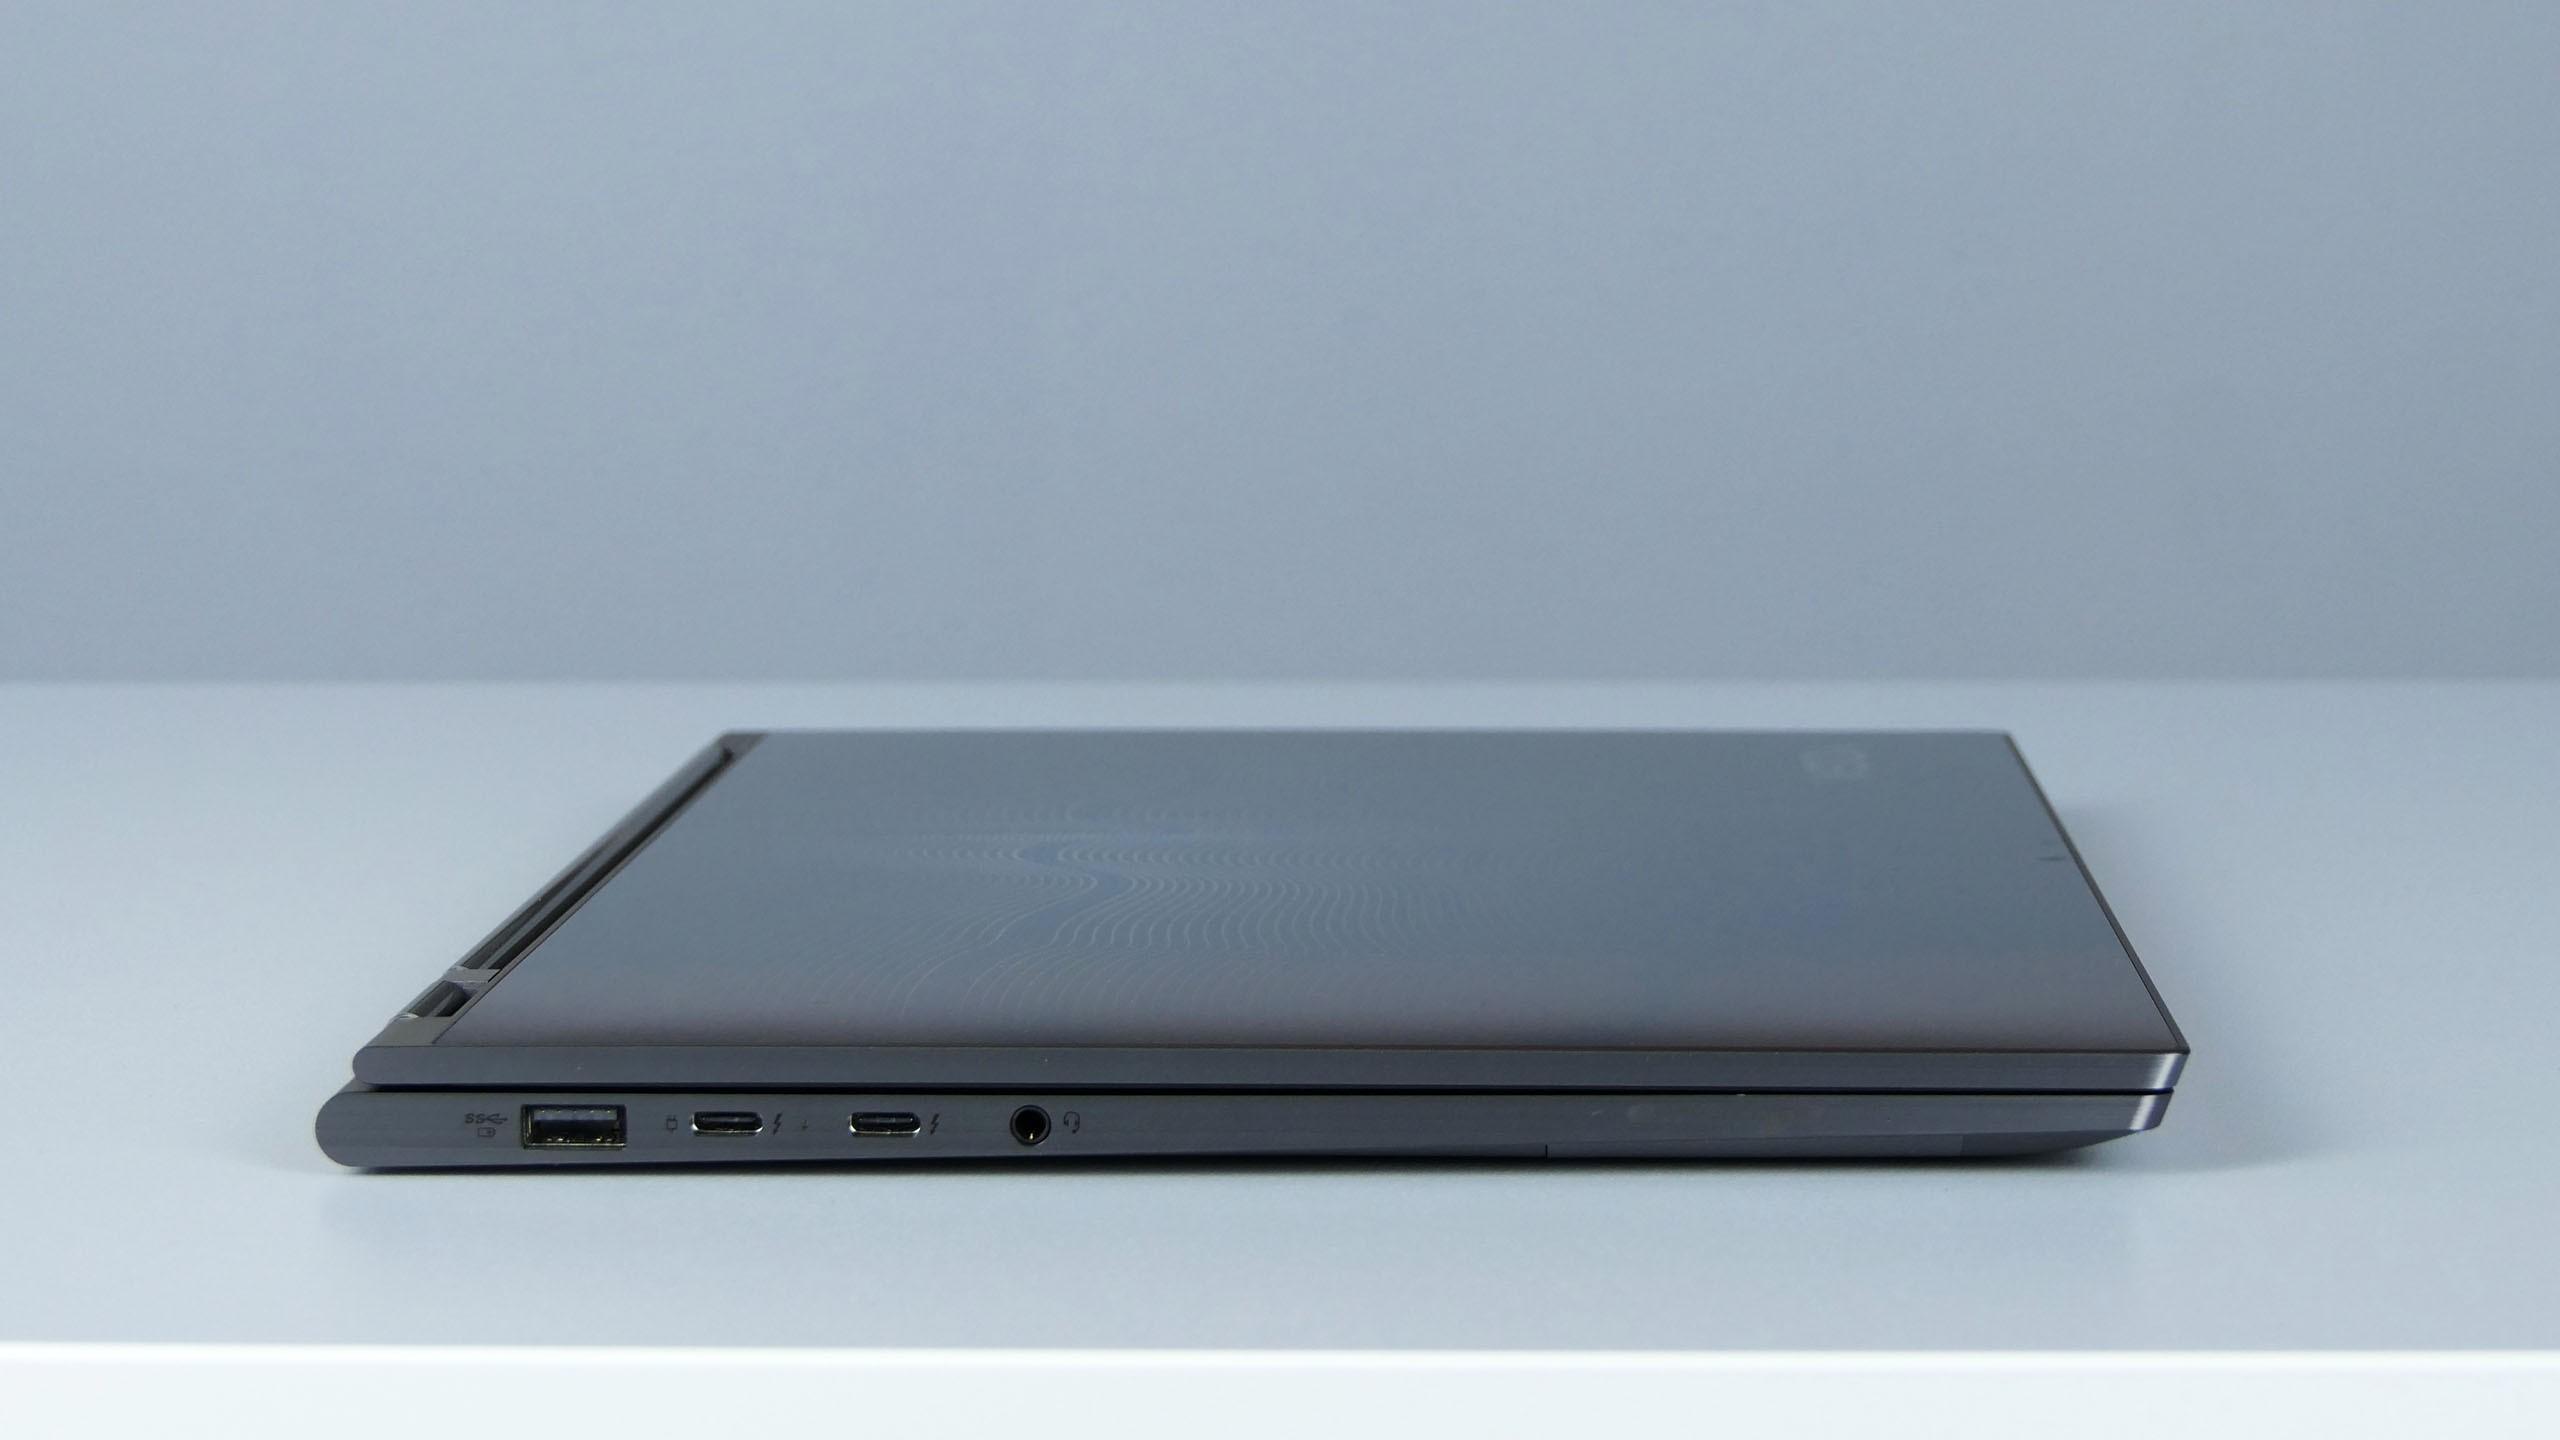 Lenovo Yoga C930 - lewy bok